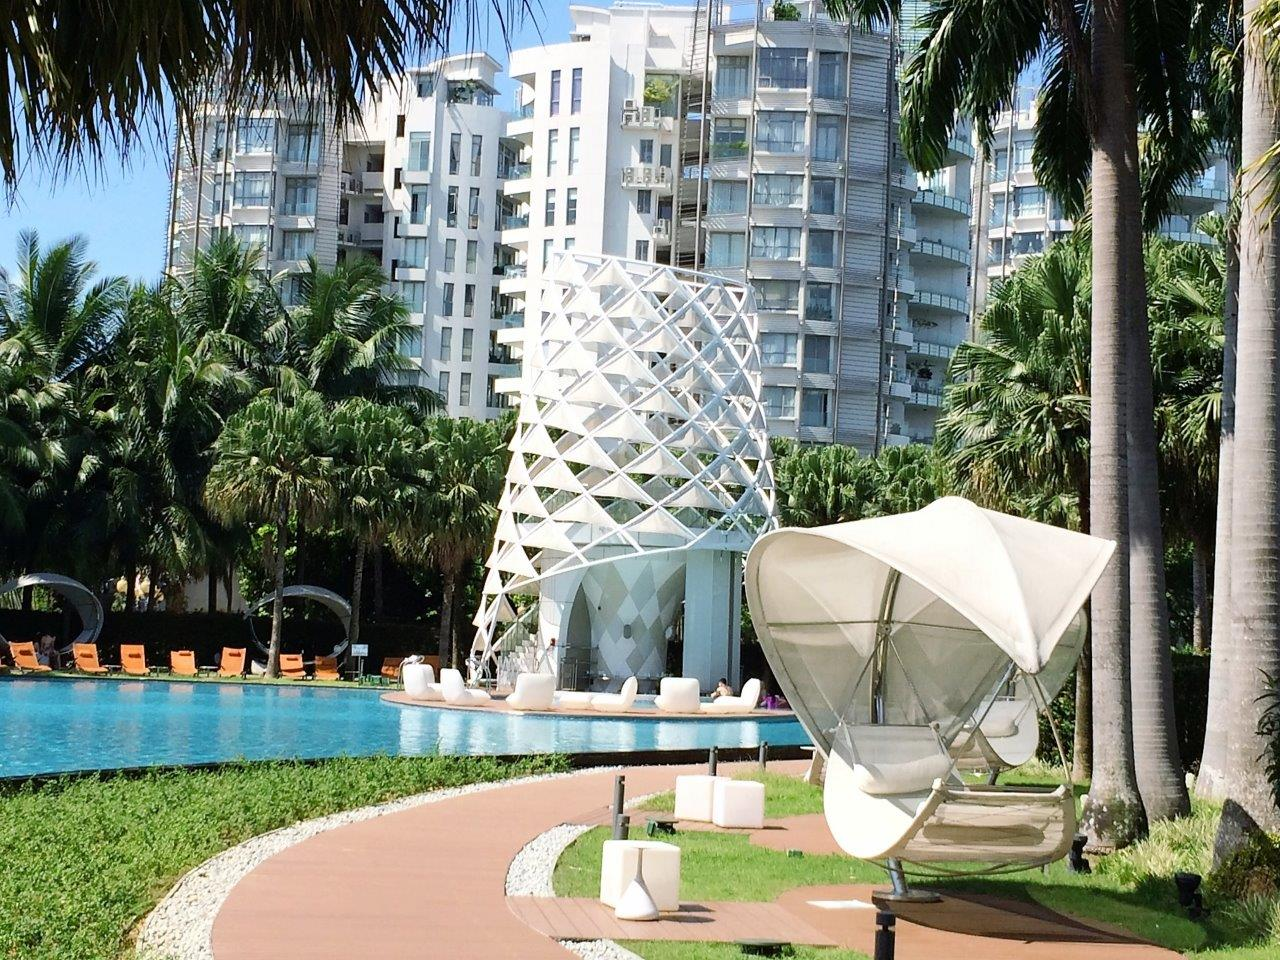 Poolside at the W Hotel, Sentosa Resort.jpg